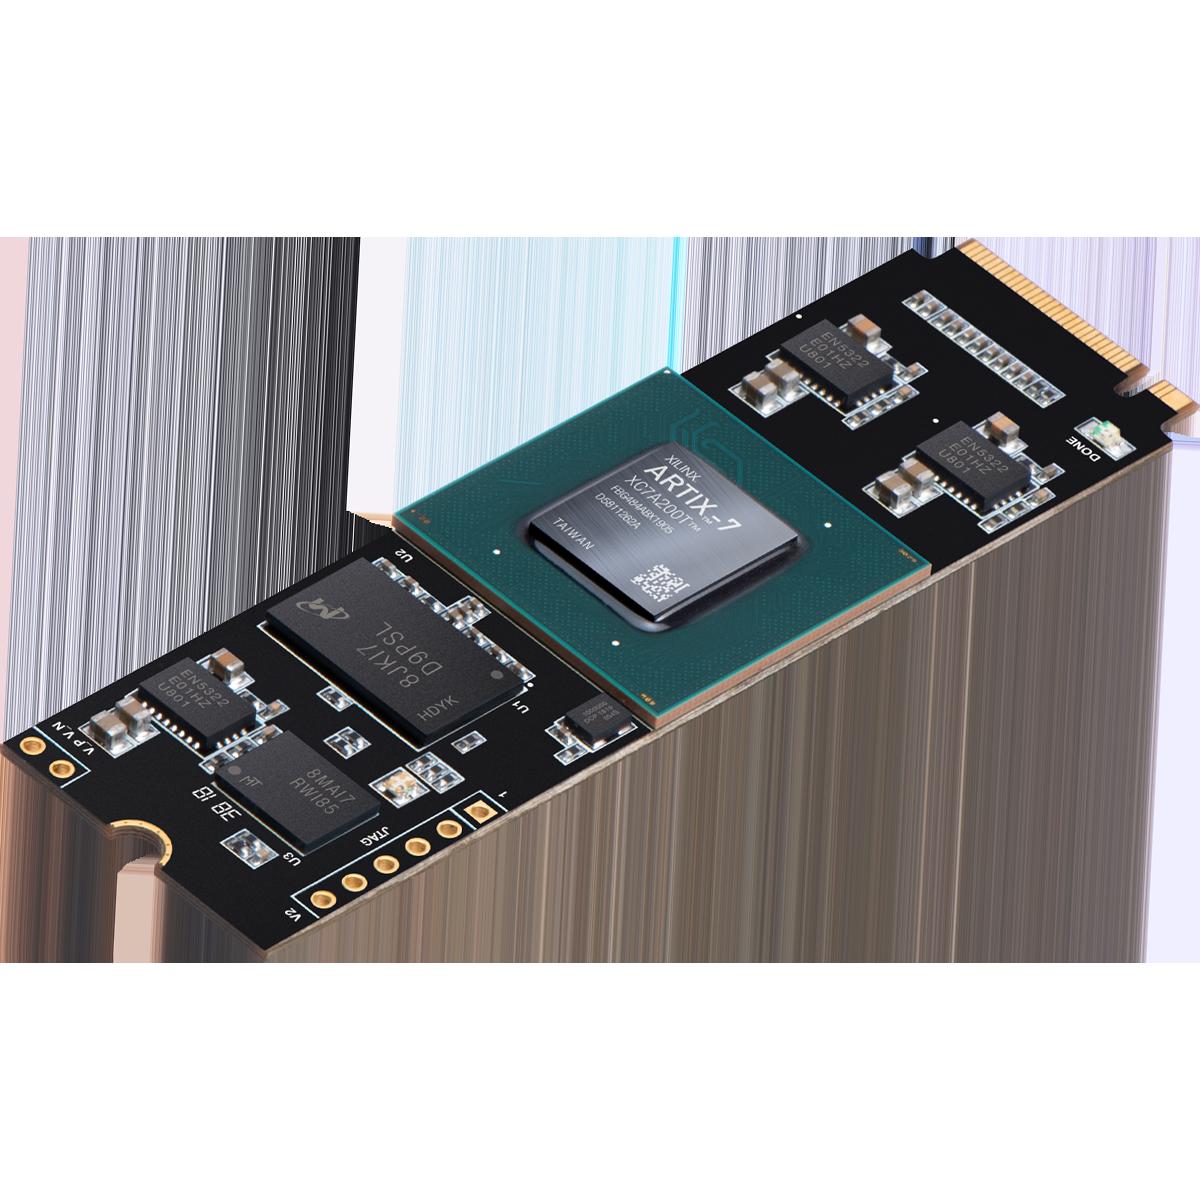 Aller Artix-7 FPGA Board with M.2 Interface